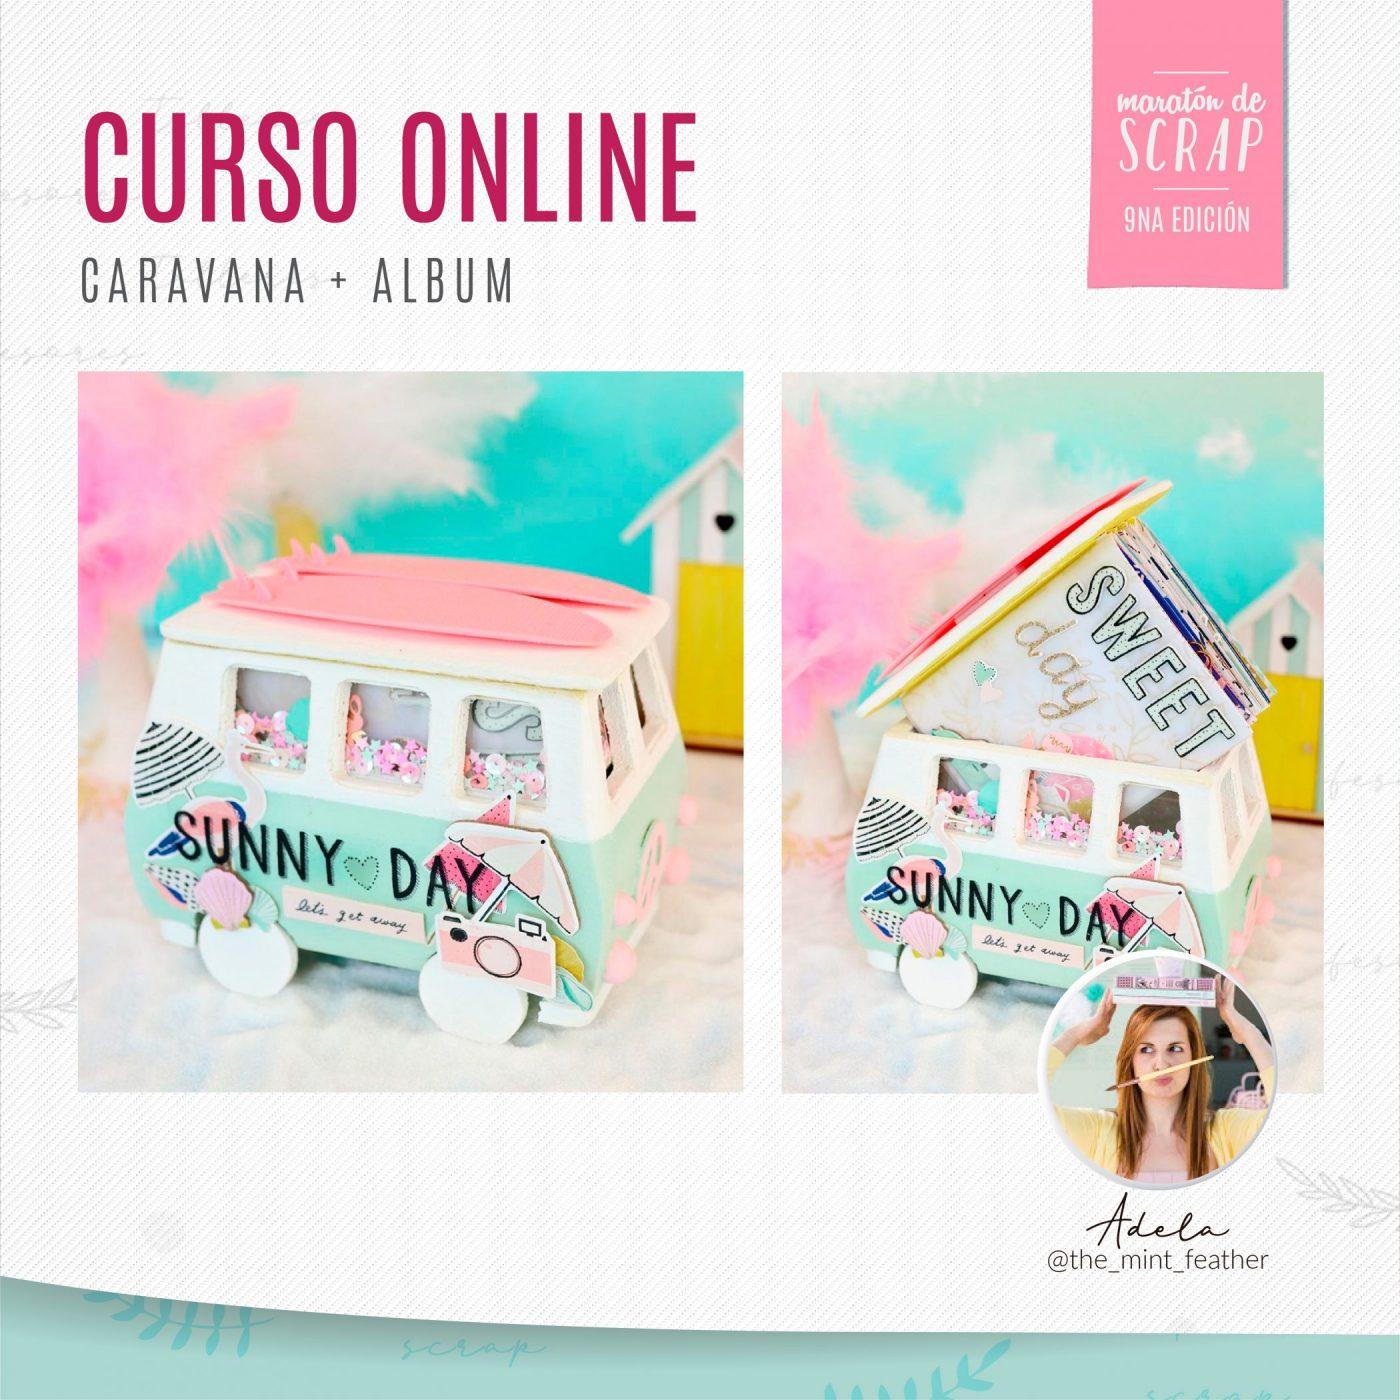 Curso online: Caravana + Album